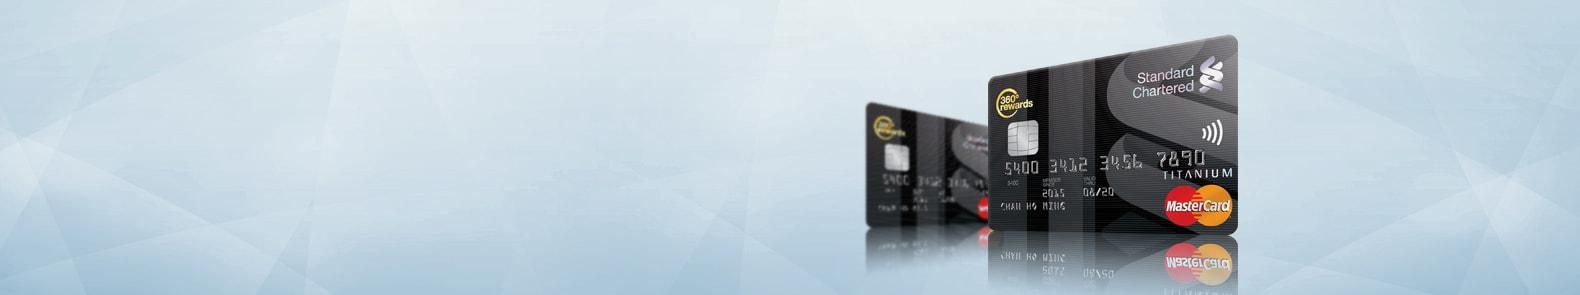 Standard Chartered Titanium Credit Card